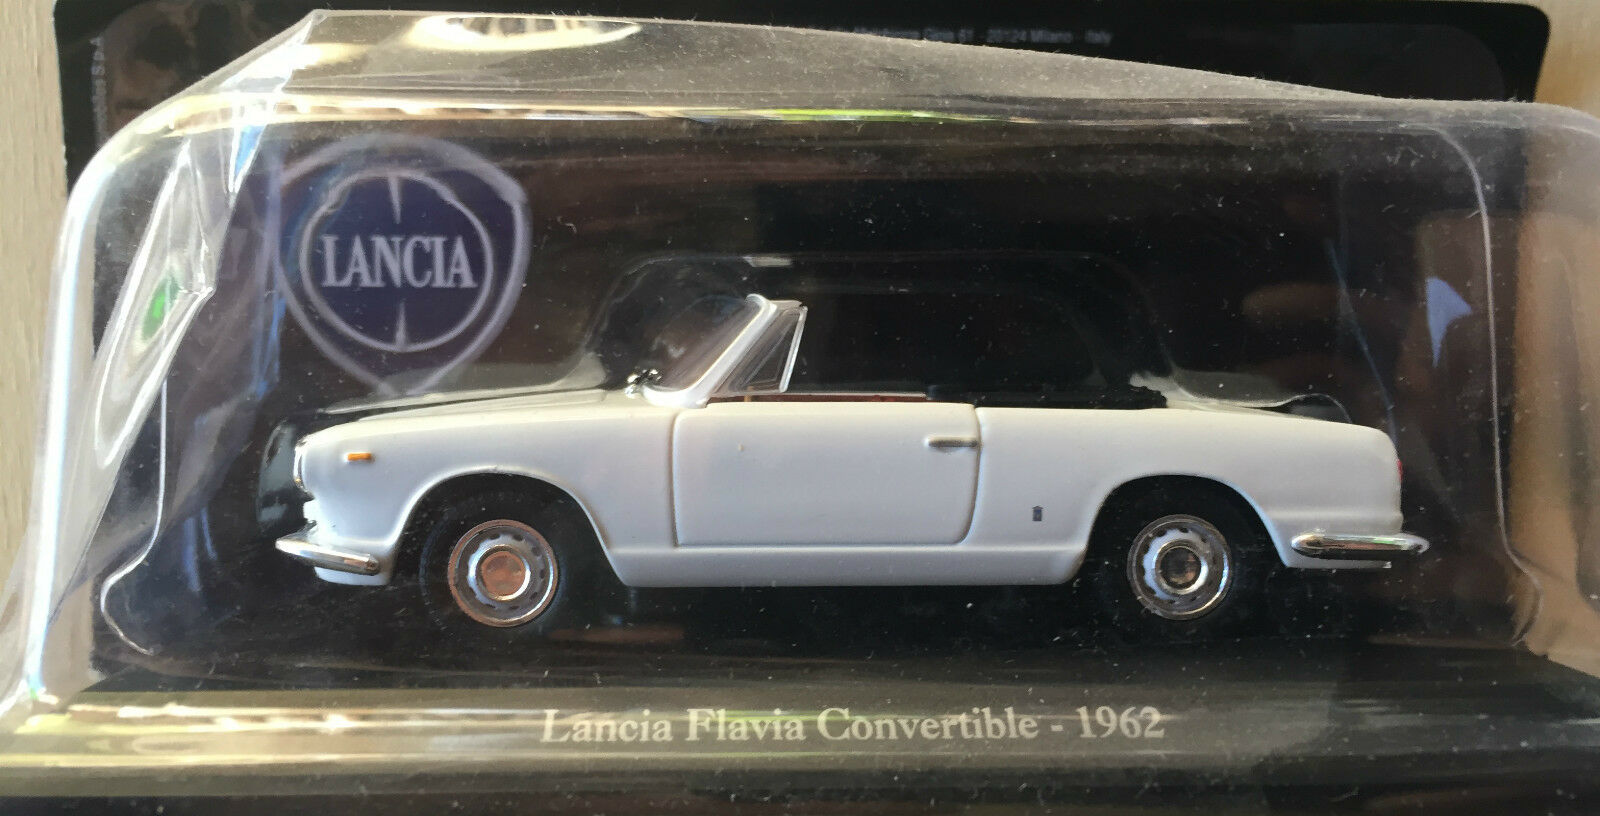 DIE CAST     LANCE FLAVIEN CONVERTIBLE - 1962    TECA RIGIDA BOÎTE 2 ÉCHELLE 1 43 acb81a